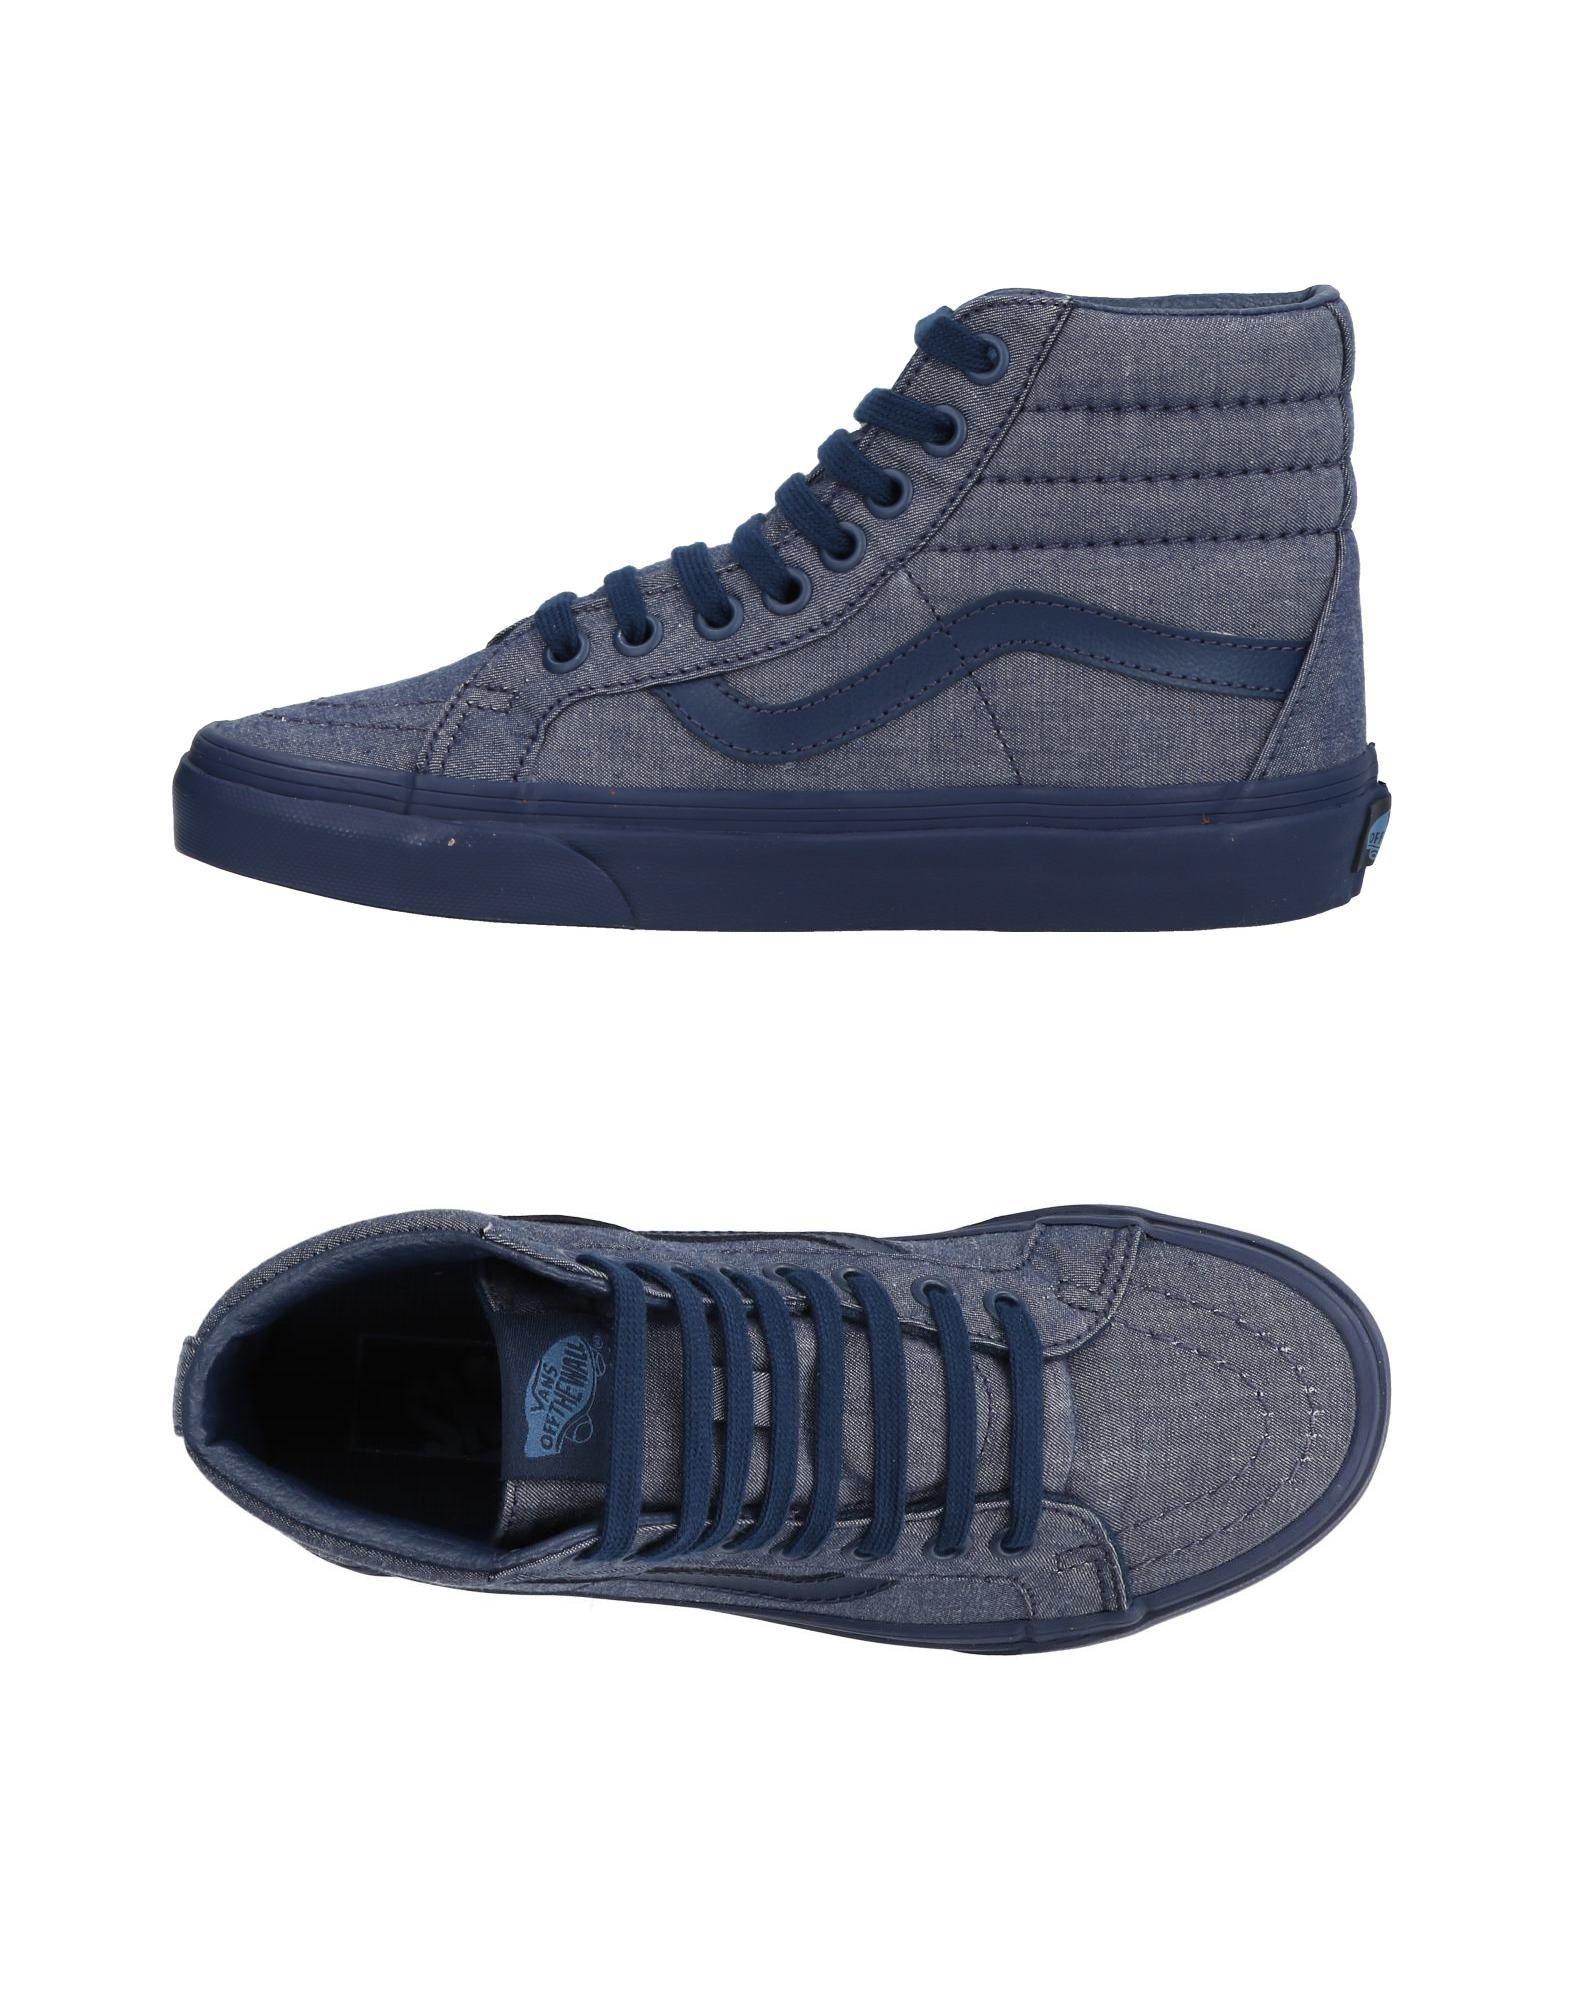 Vans Sneakers Damen  11494943KP Gute Qualität beliebte Schuhe